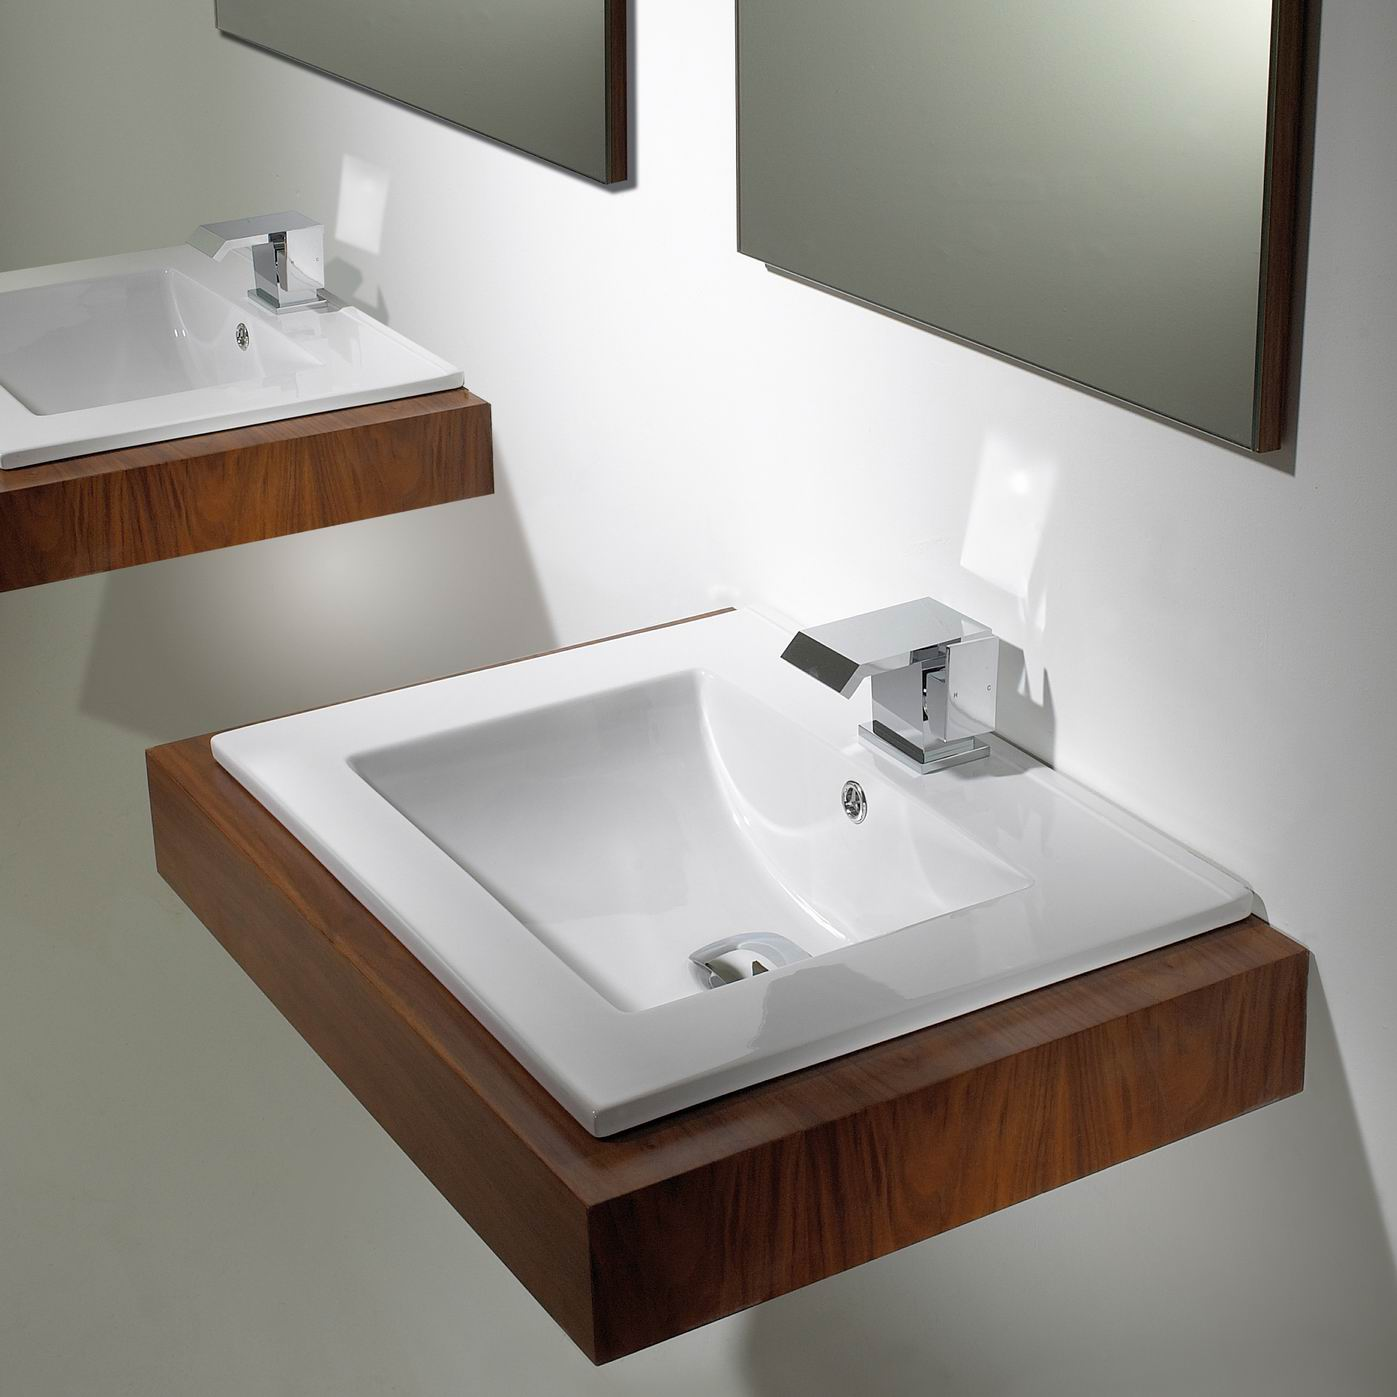 Top mount bathroom sinks - Bathroom Basins The Alternative Bathroom Blog